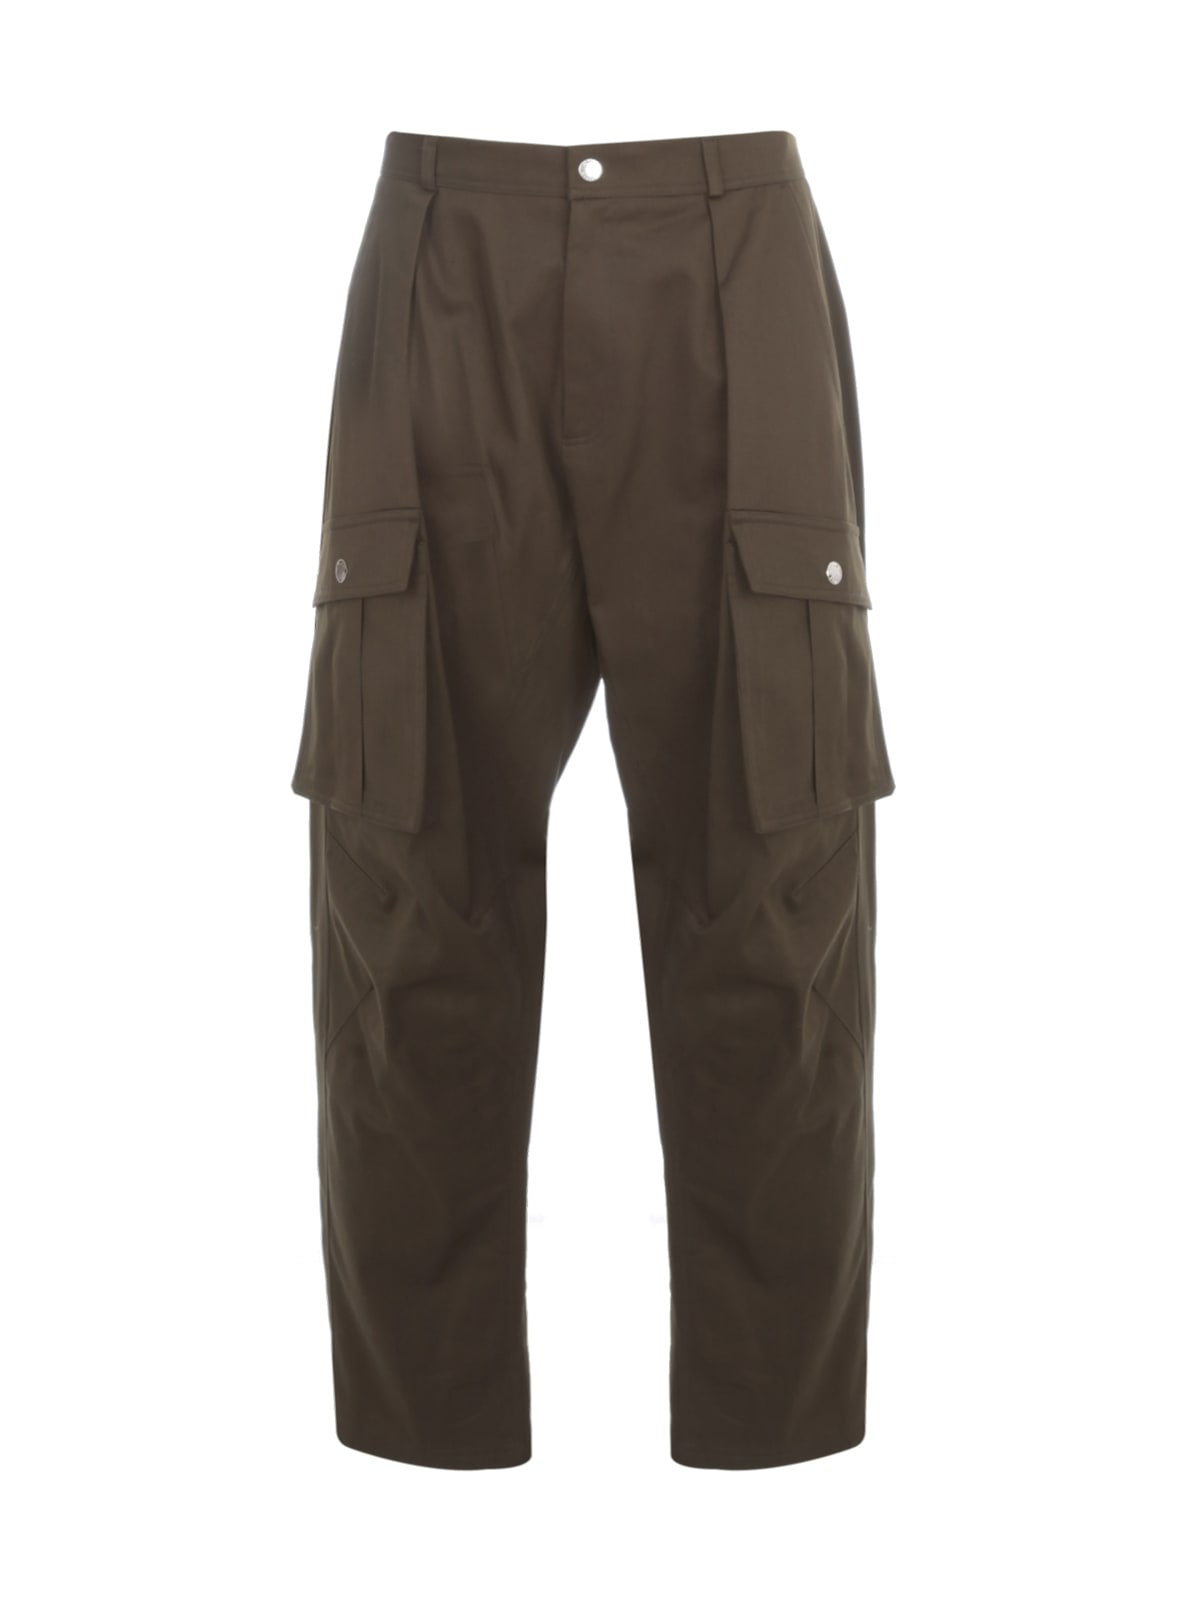 Les Hommes LOW CROTCH CASUAL PANTS W/ POCKETS